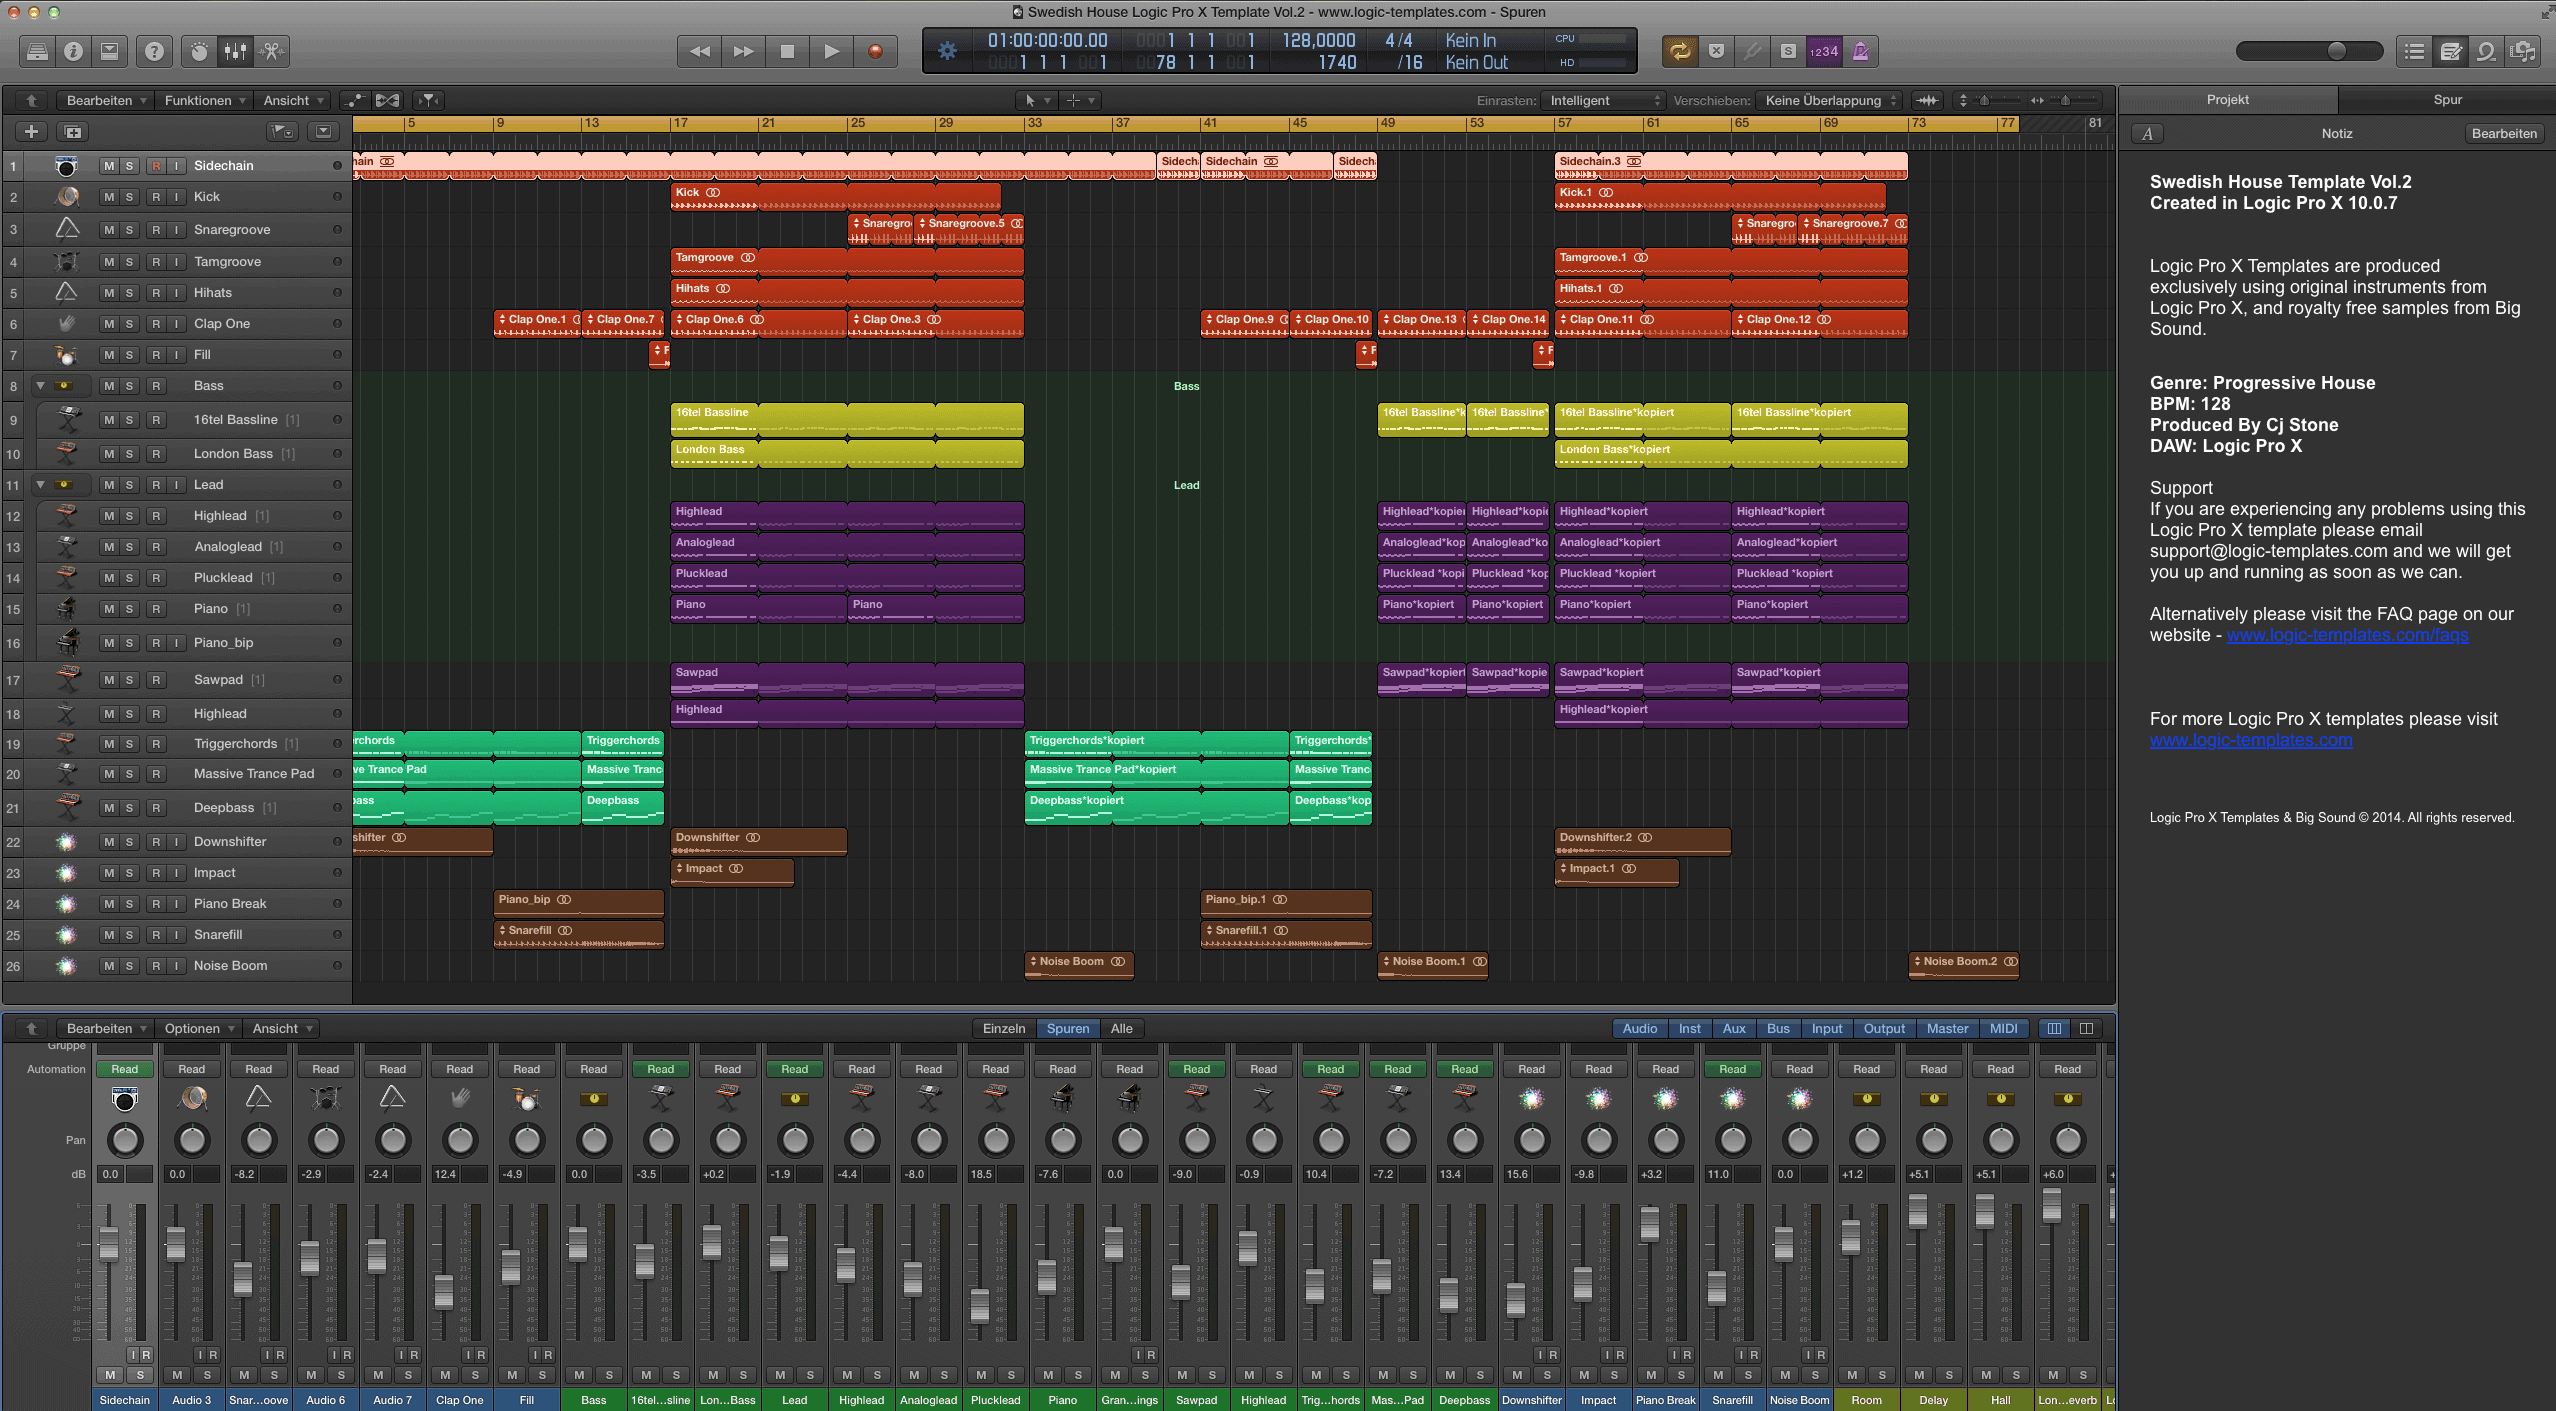 Swedish House Logic Pro X Template Vol.2